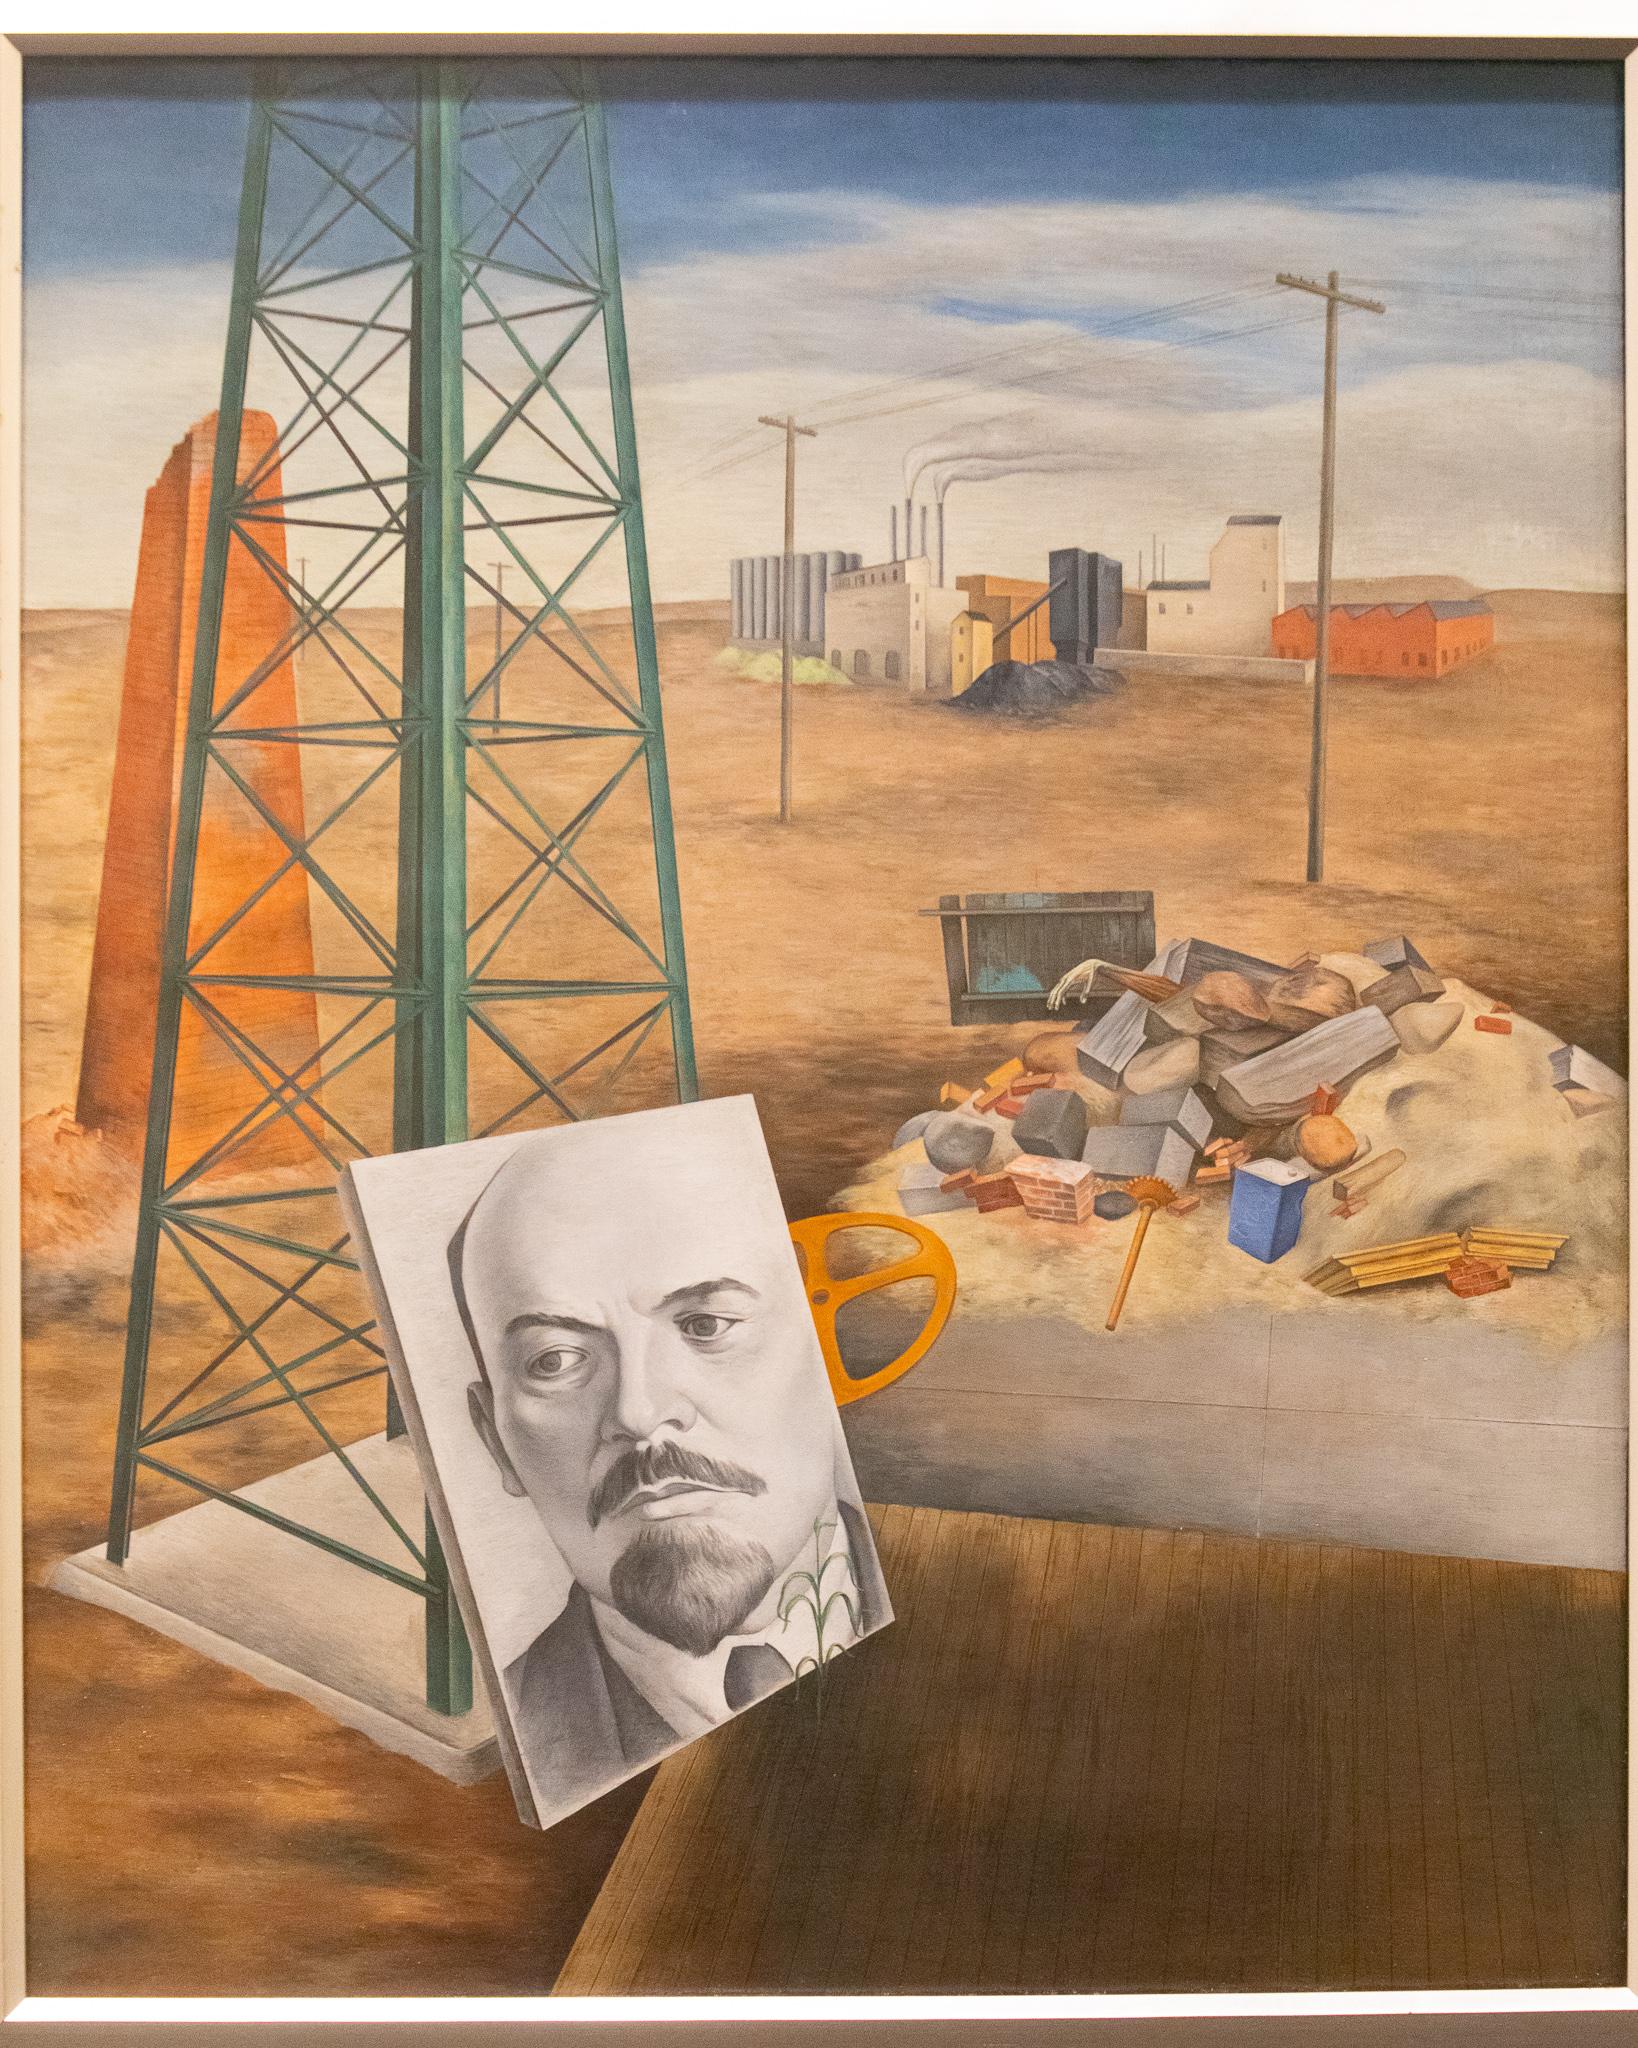 U2A3891 - Sheldon art exhibition shows waste drives human life